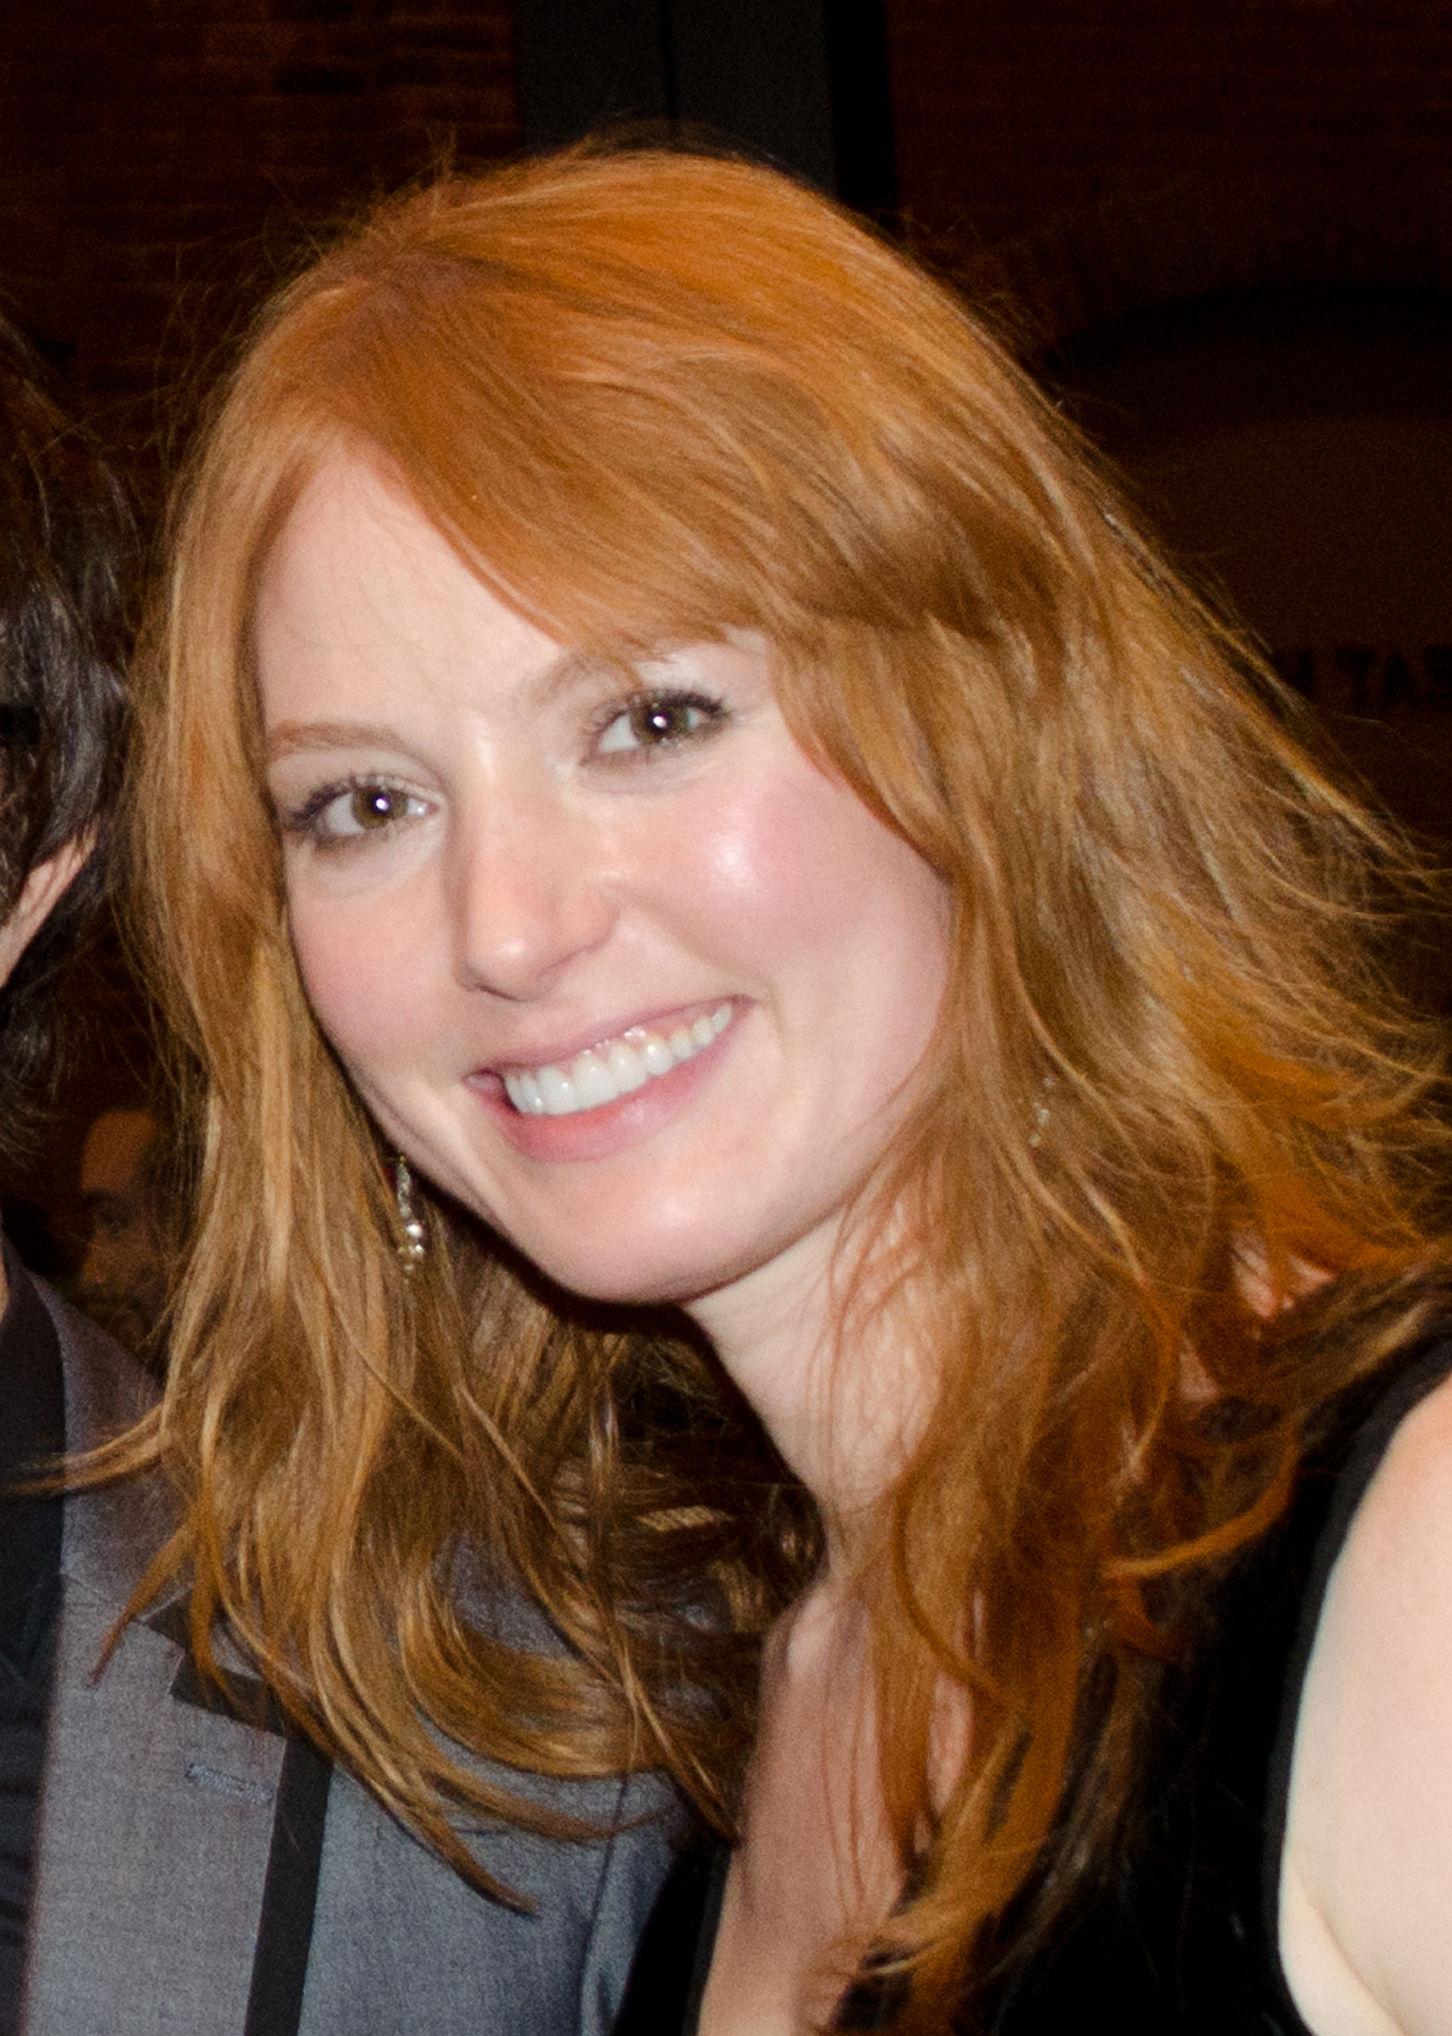 Photo of Alicia Witt: American actress